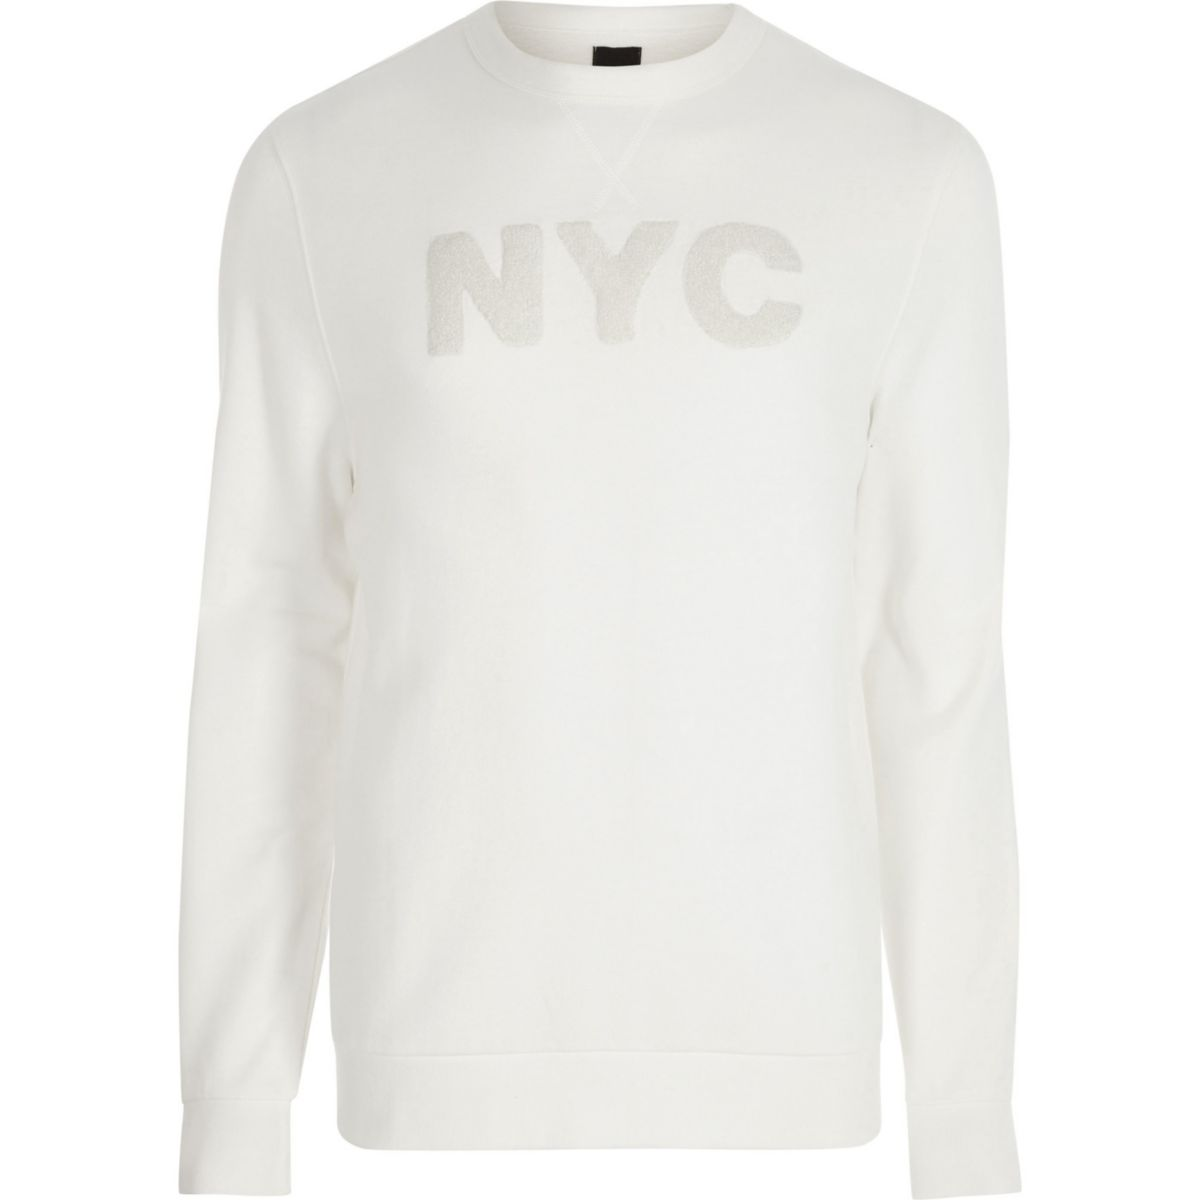 White long sleeve 'NYC' applique sweatshirt